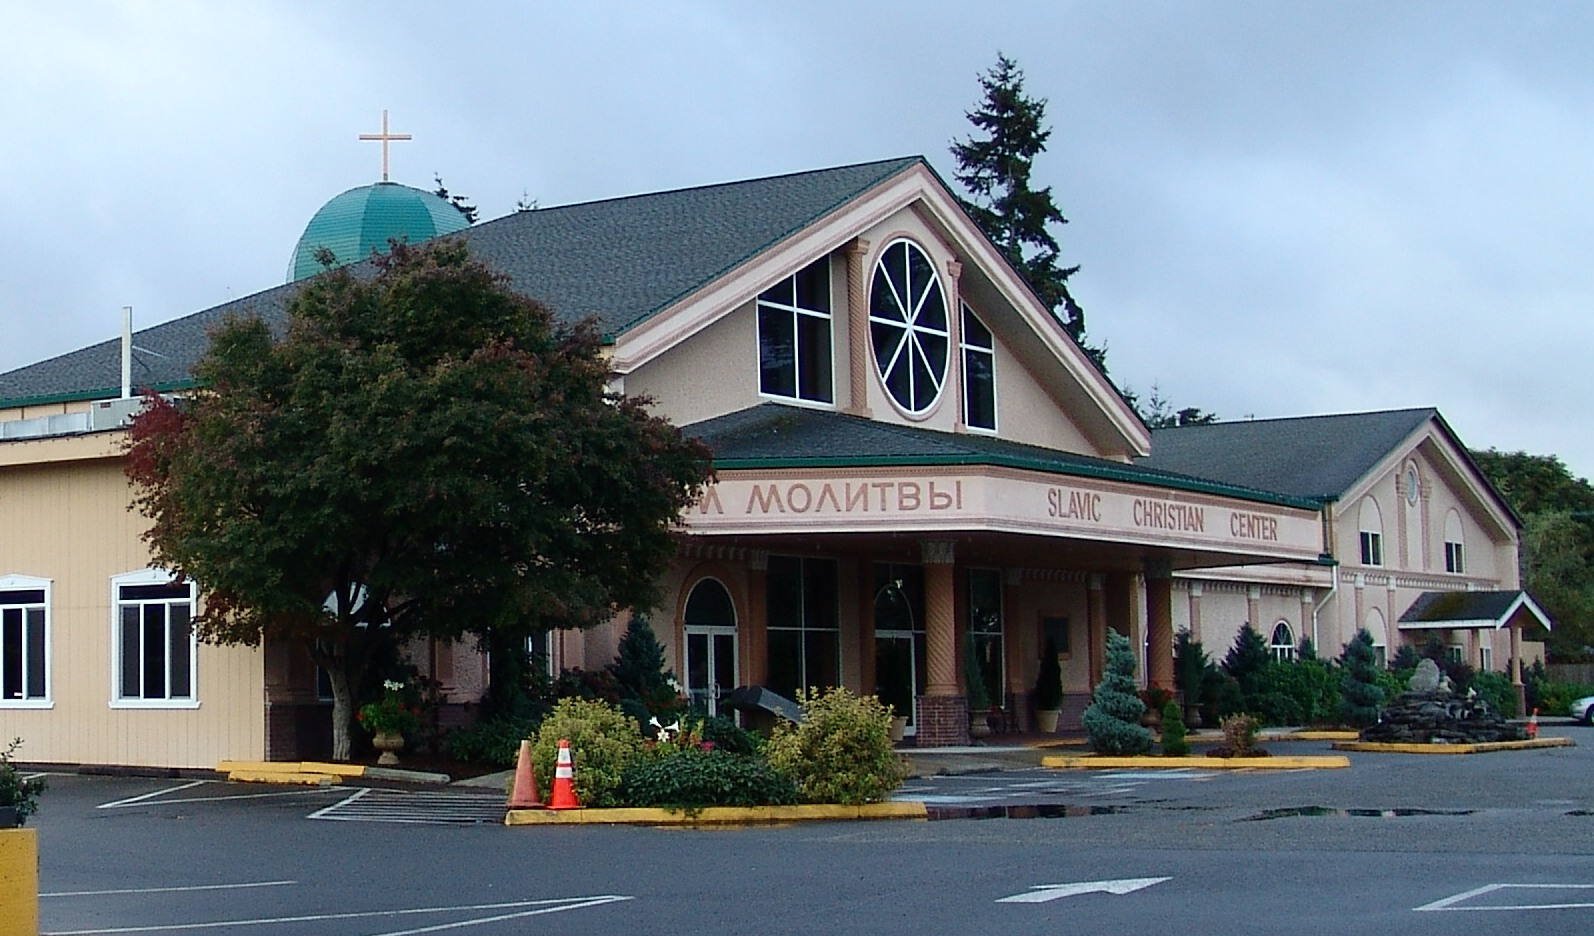 Slavic Christian Center of Tacoma, WA